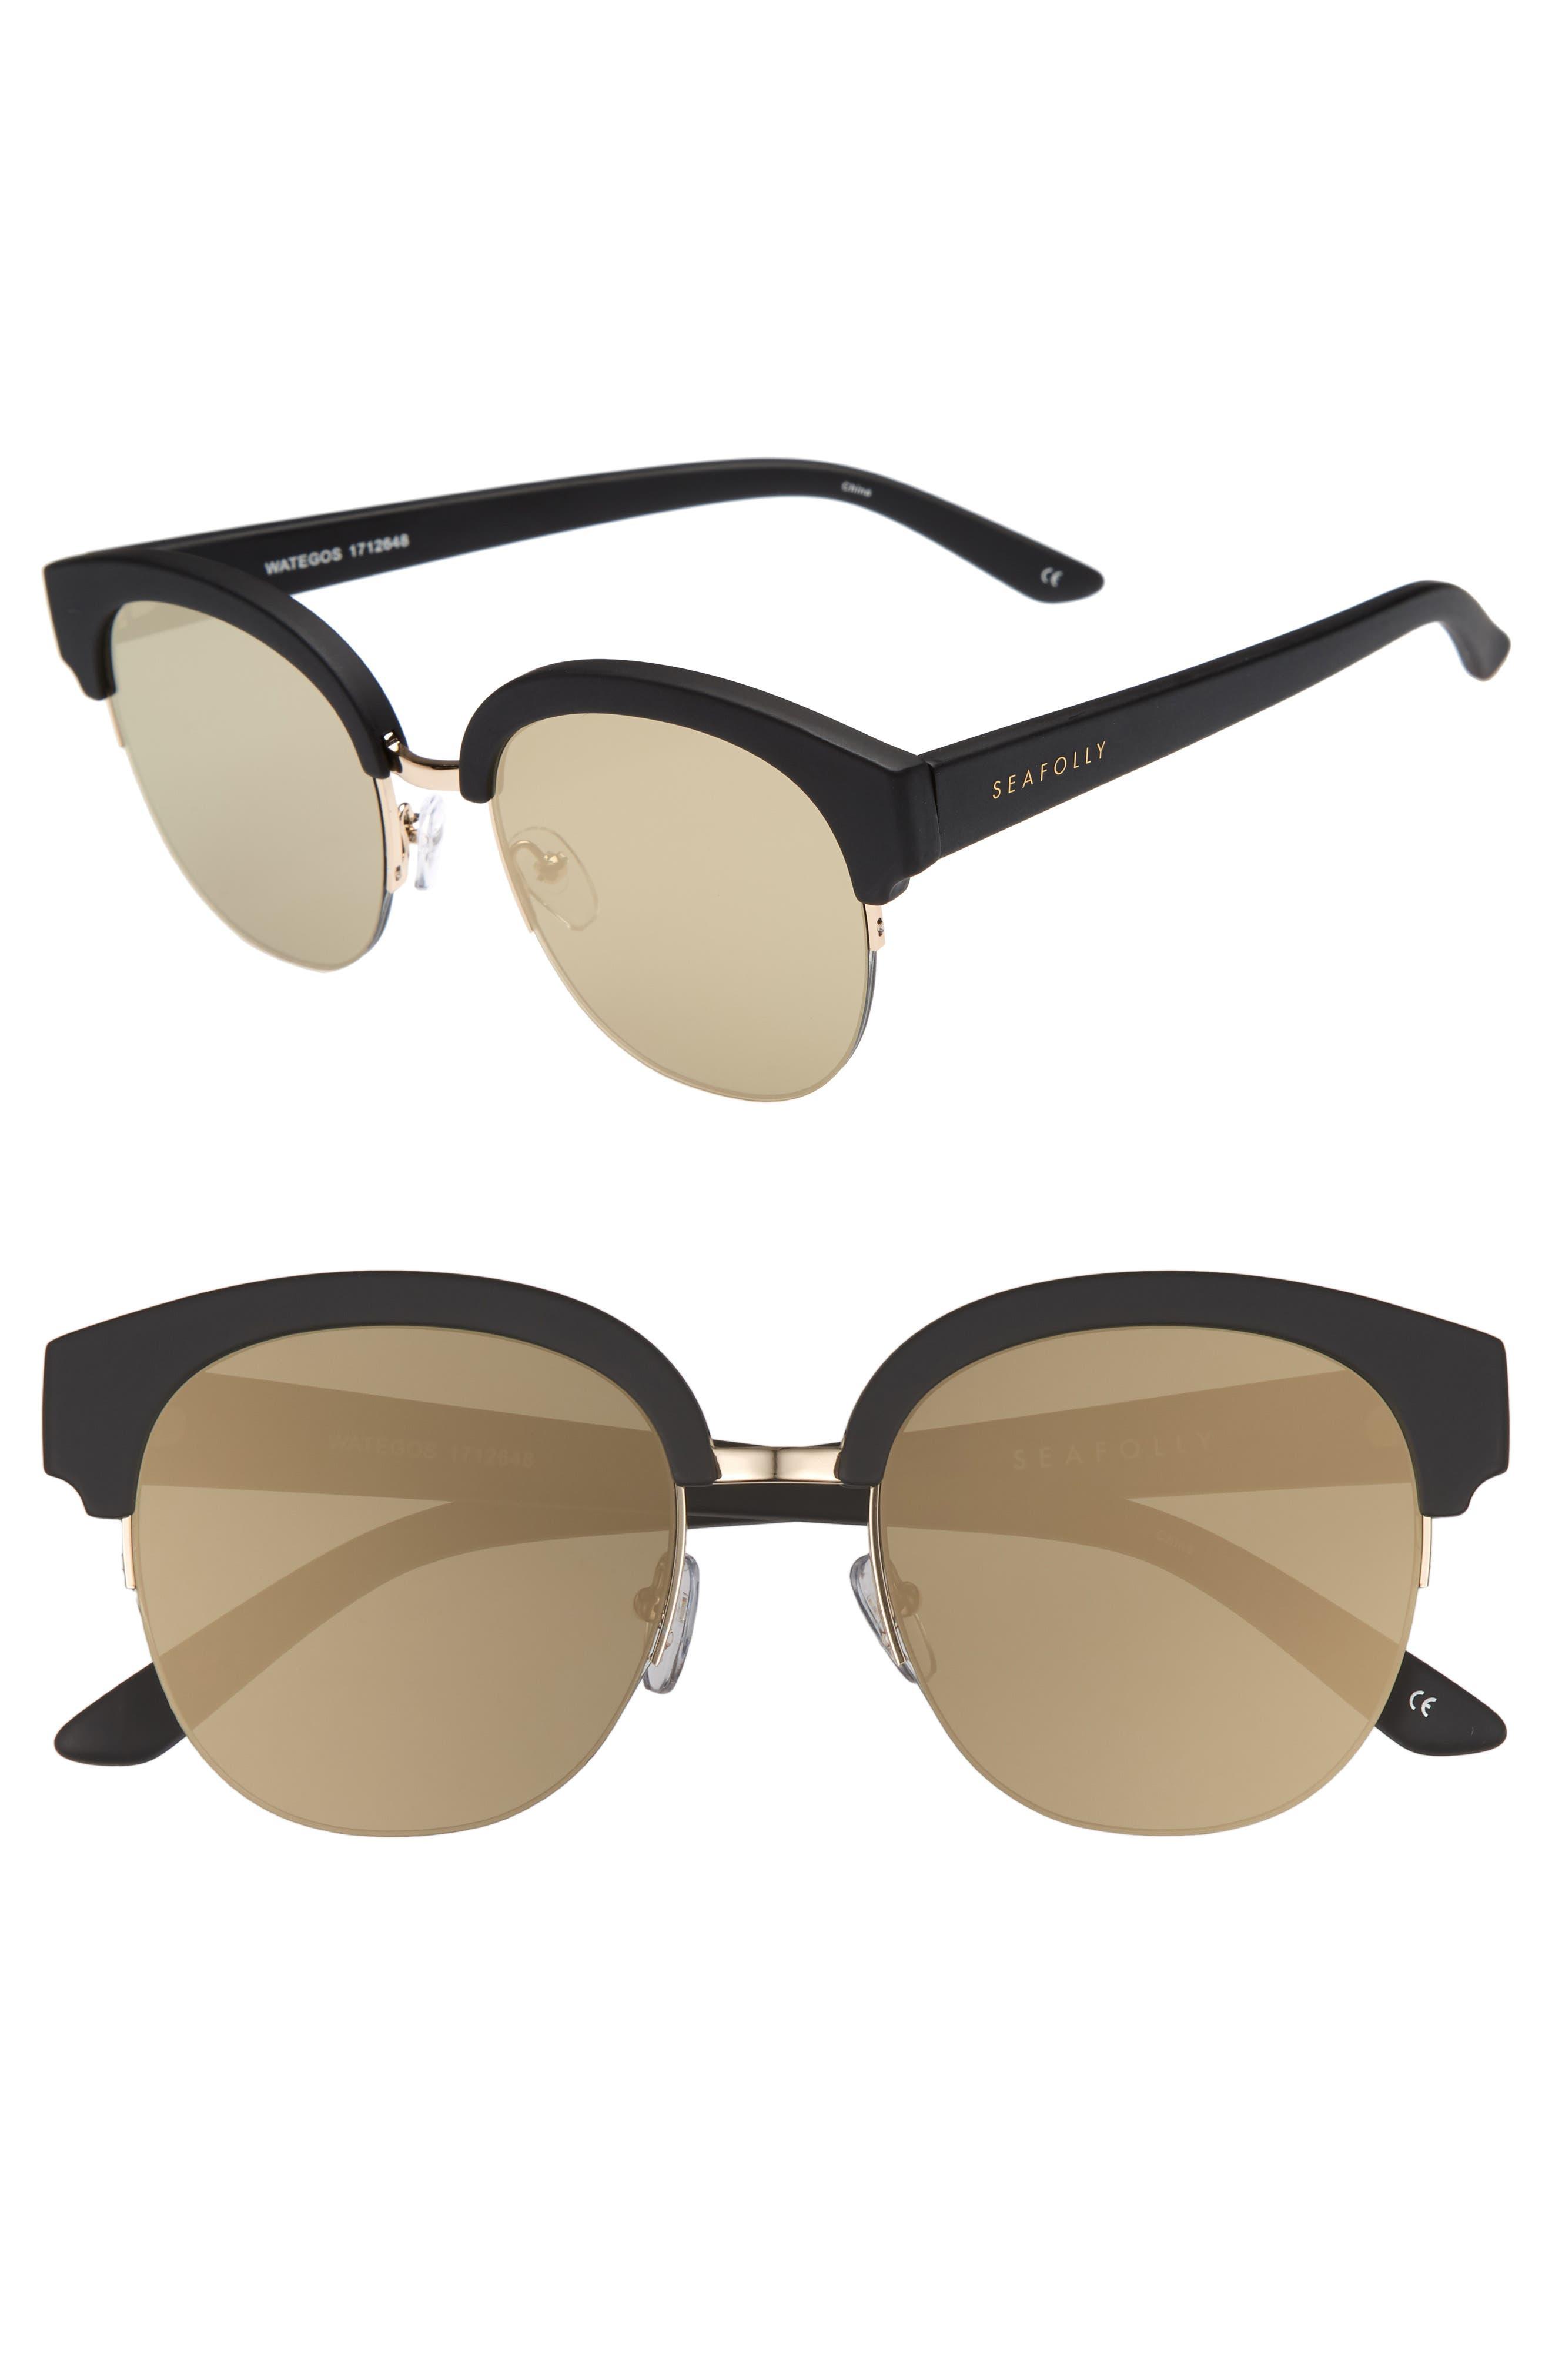 Wategos 53mm Cat Eye Sunglasses,                             Main thumbnail 1, color,                             Black